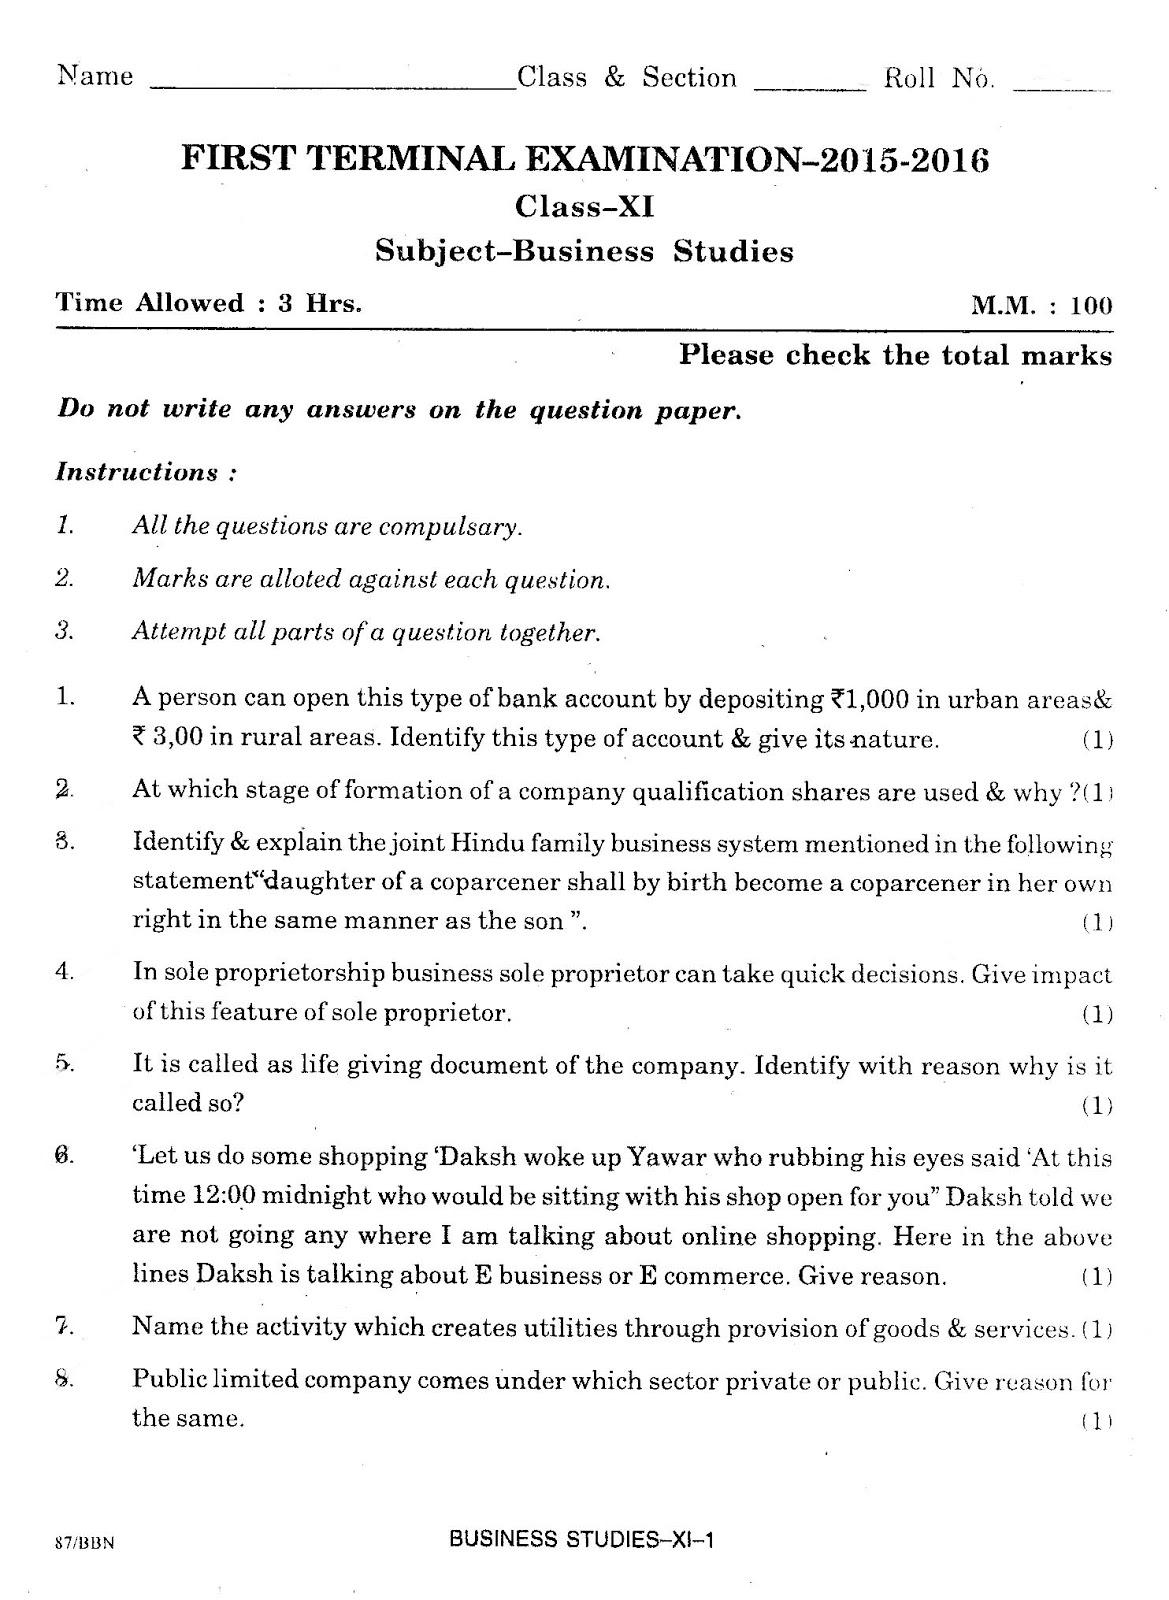 Bst4all class xi business studies birla vidya niketan school first class xi business studies birla vidya niketan school first term question paper 2015 2016 malvernweather Gallery